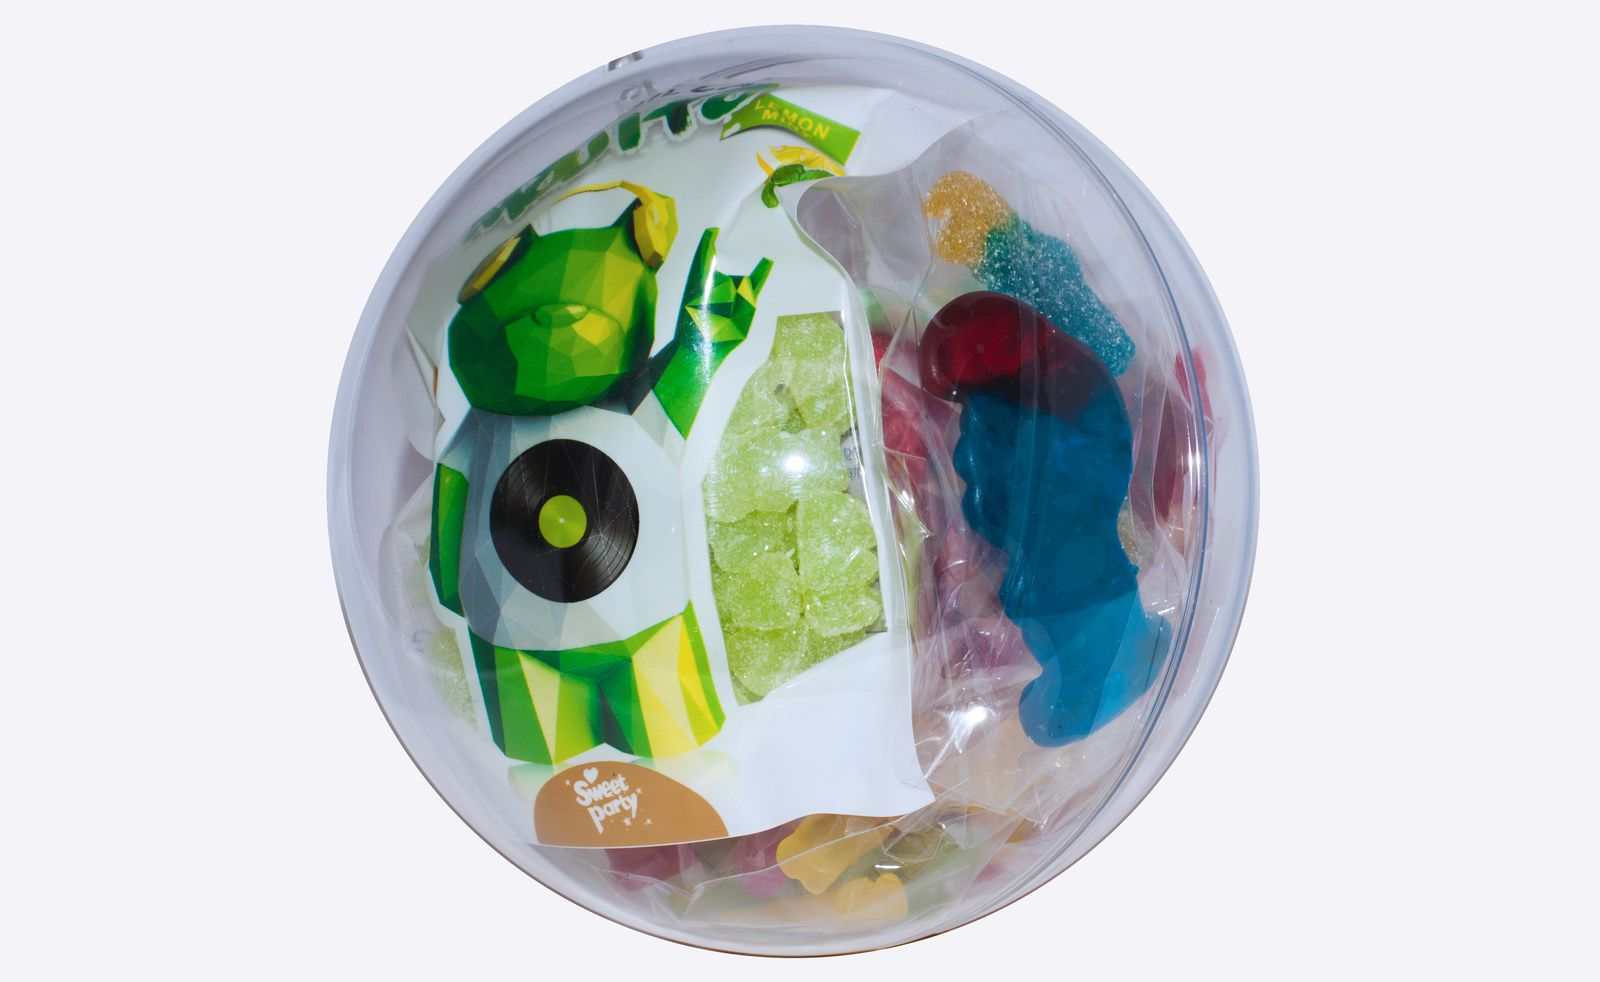 Partenaire&#x3B; ricola, my candy box, fisherman's friend, godiva